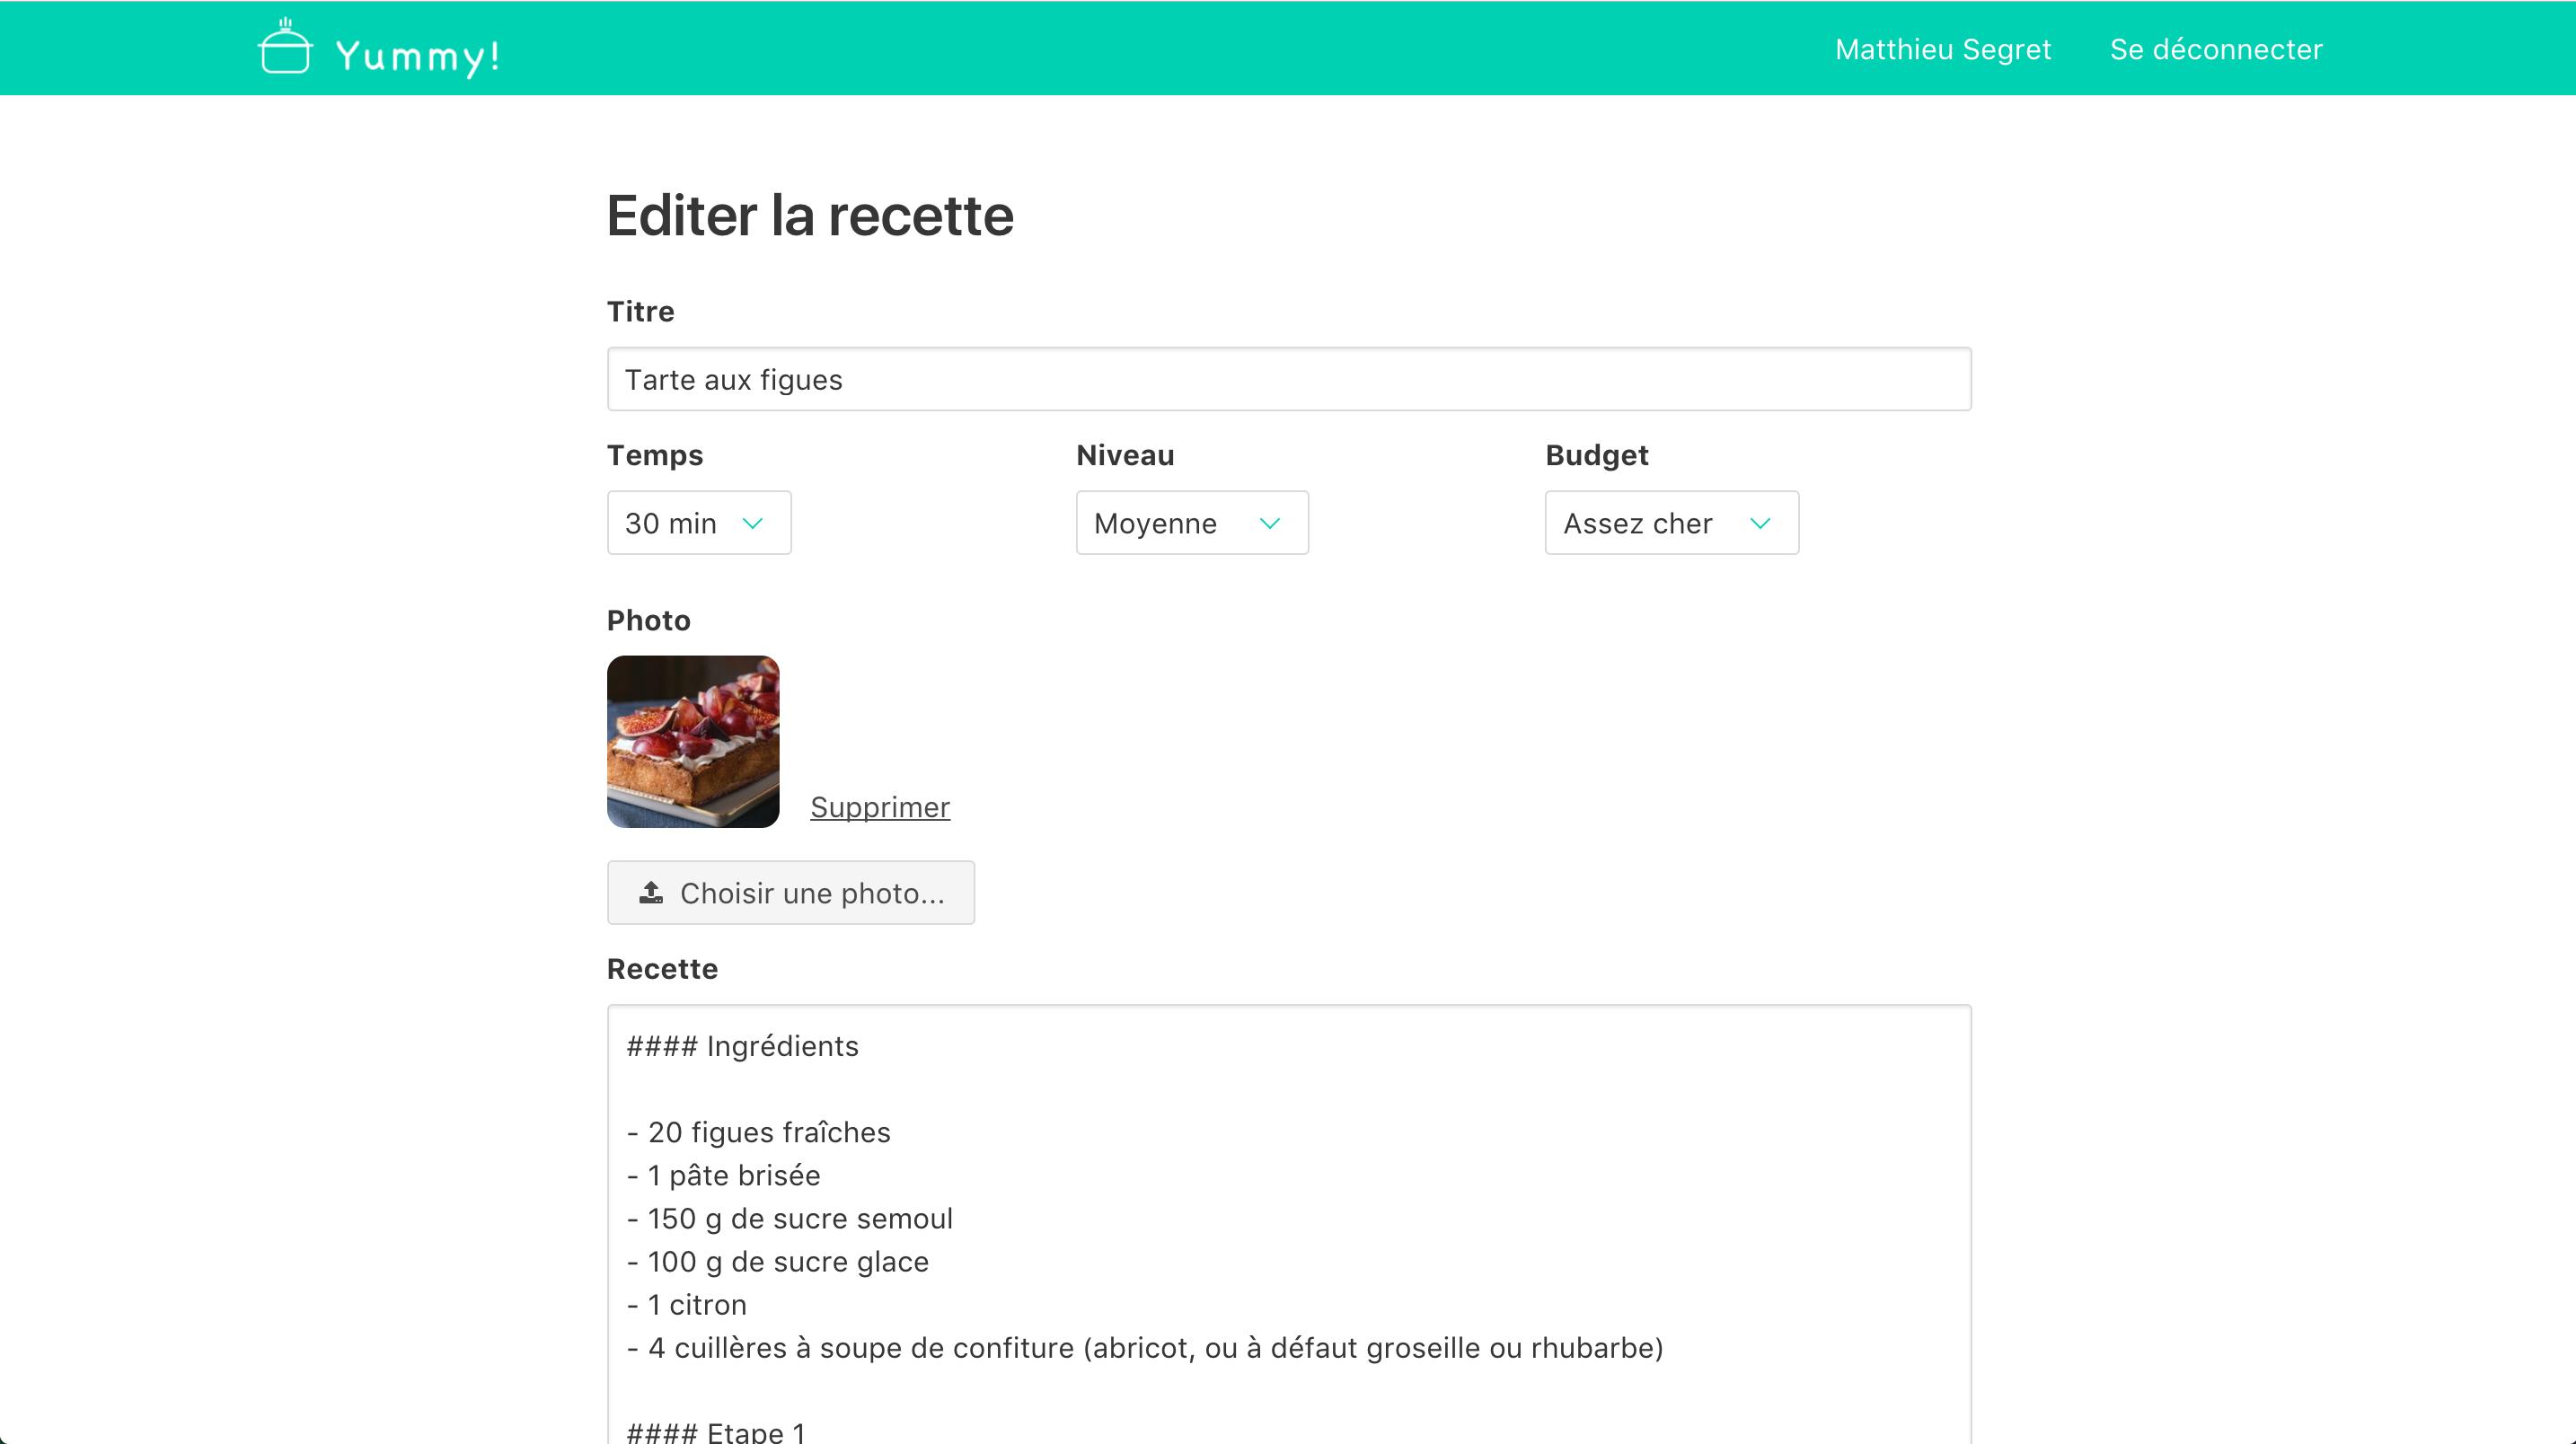 Editing recipe